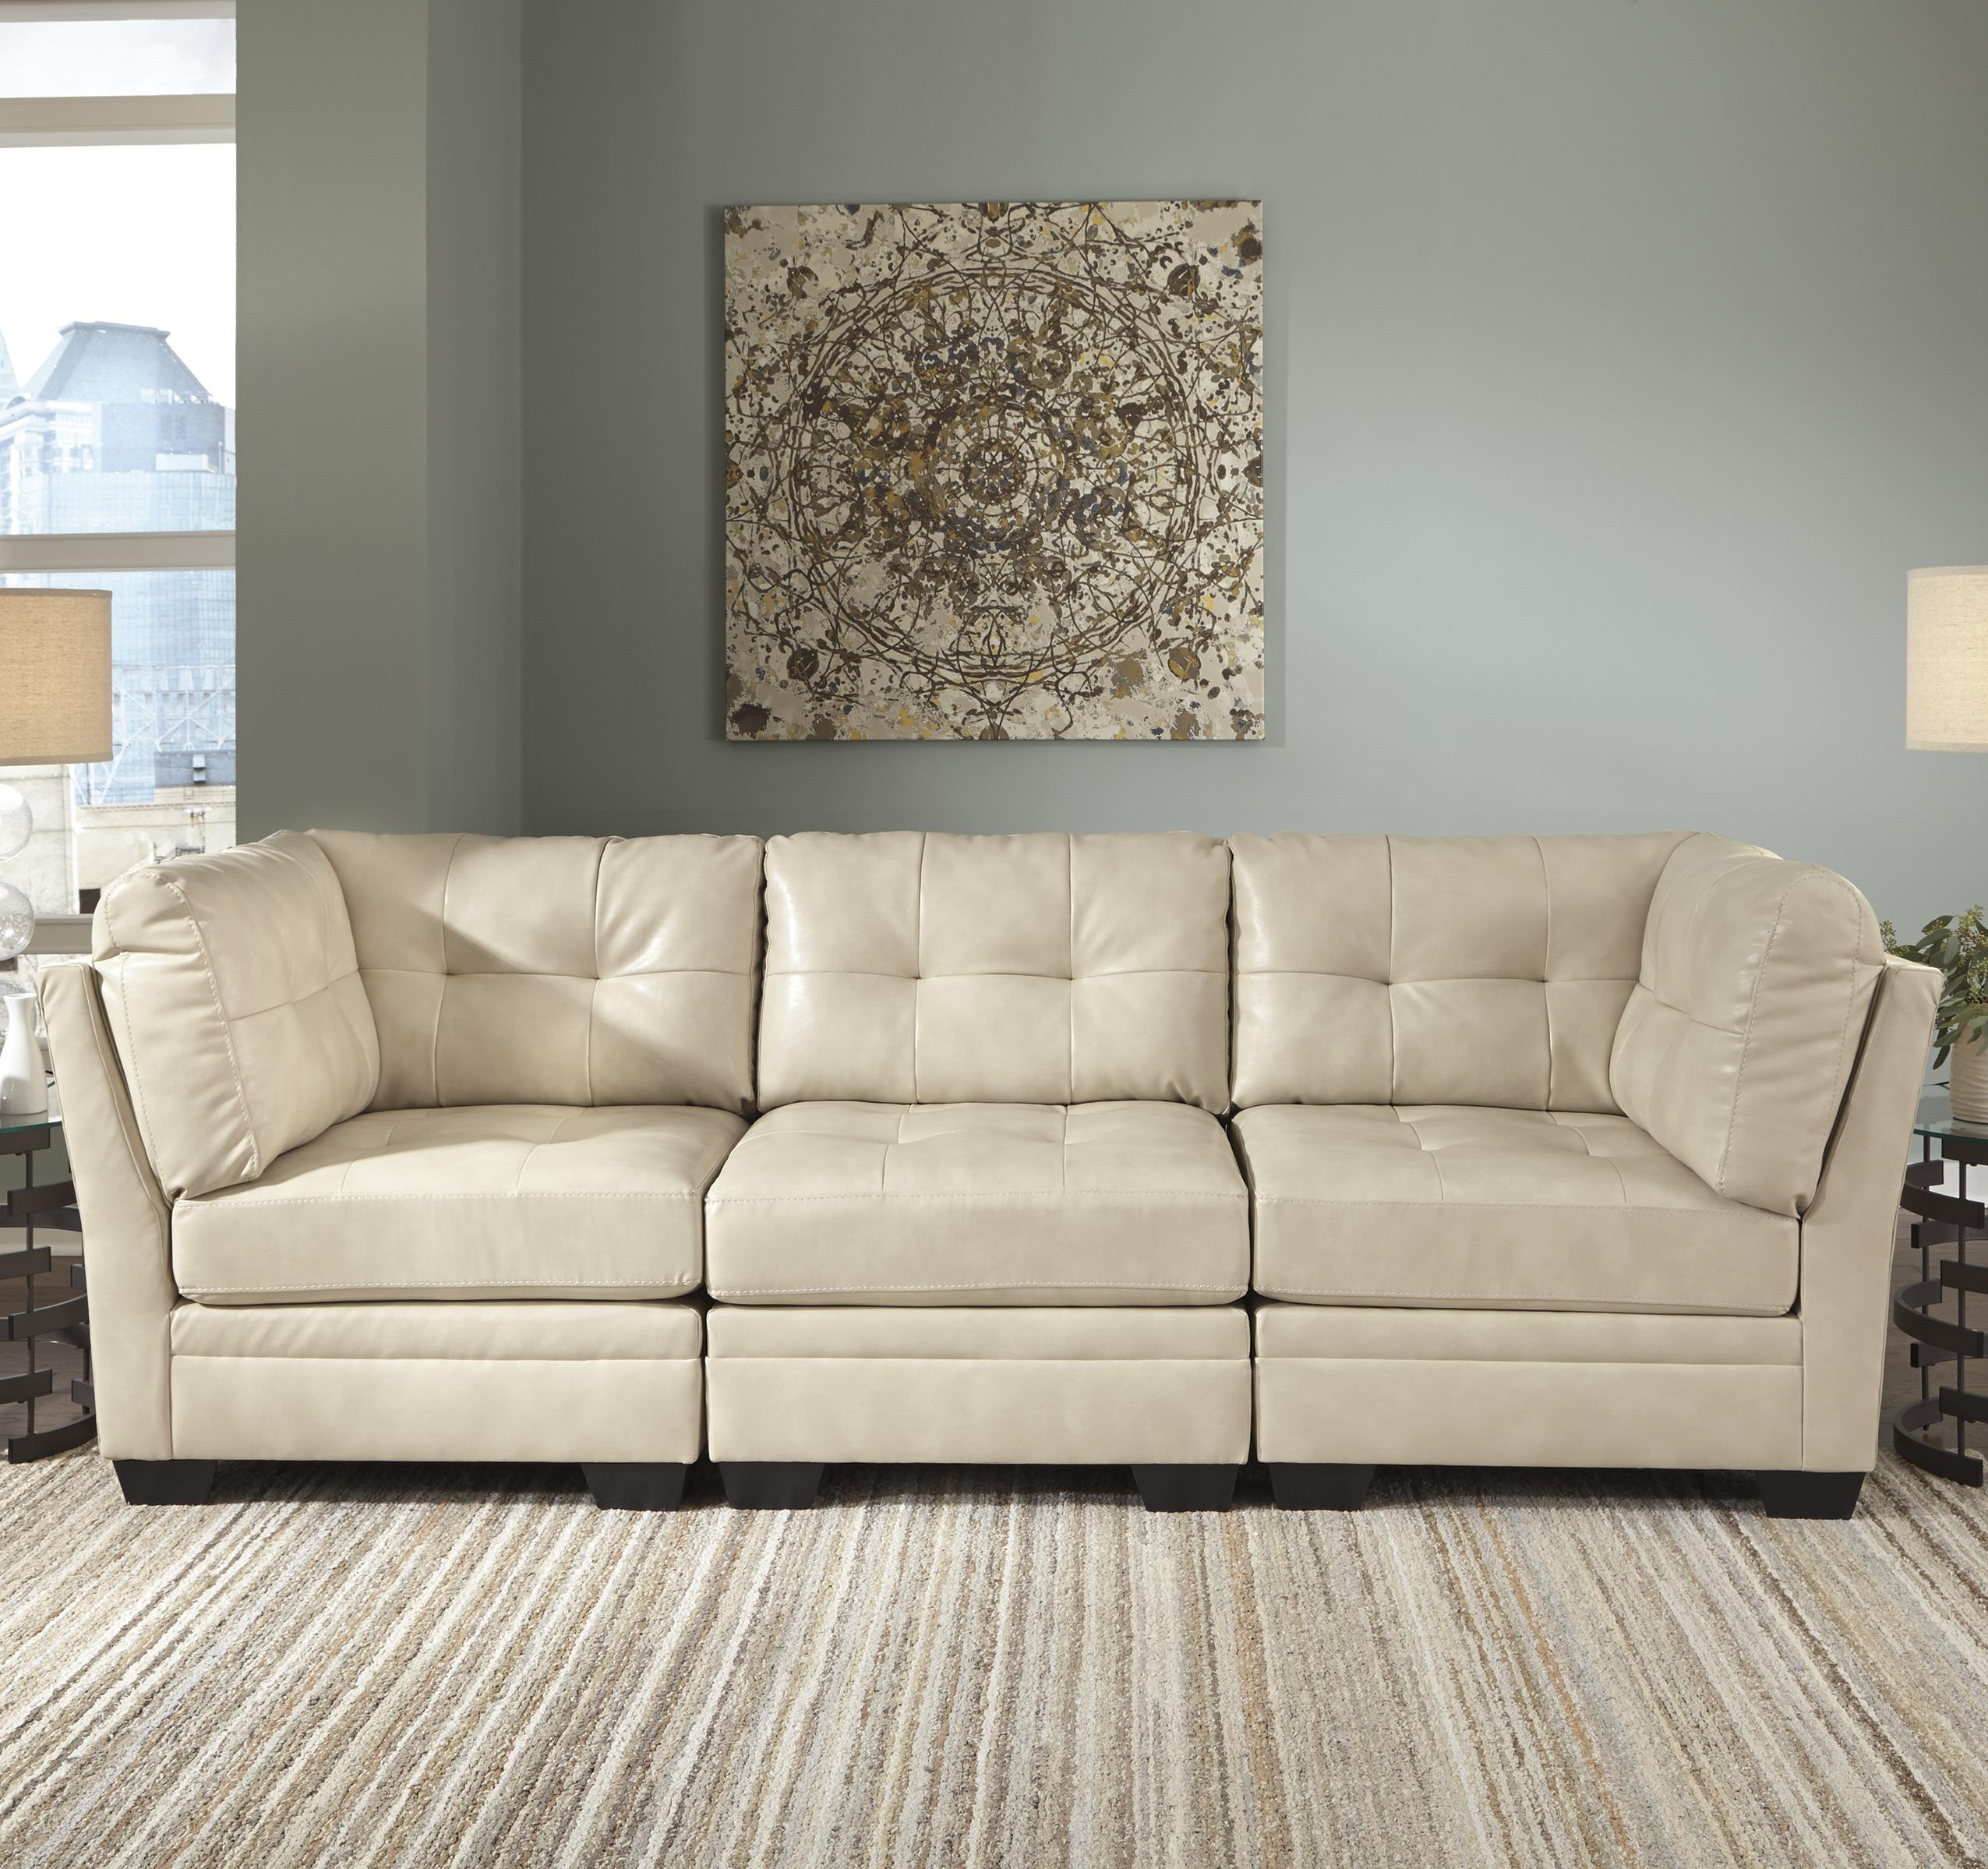 Signature Design by Ashley Khalil DuraBlend® Modular Sofa - Item Number: 6180446+2x51